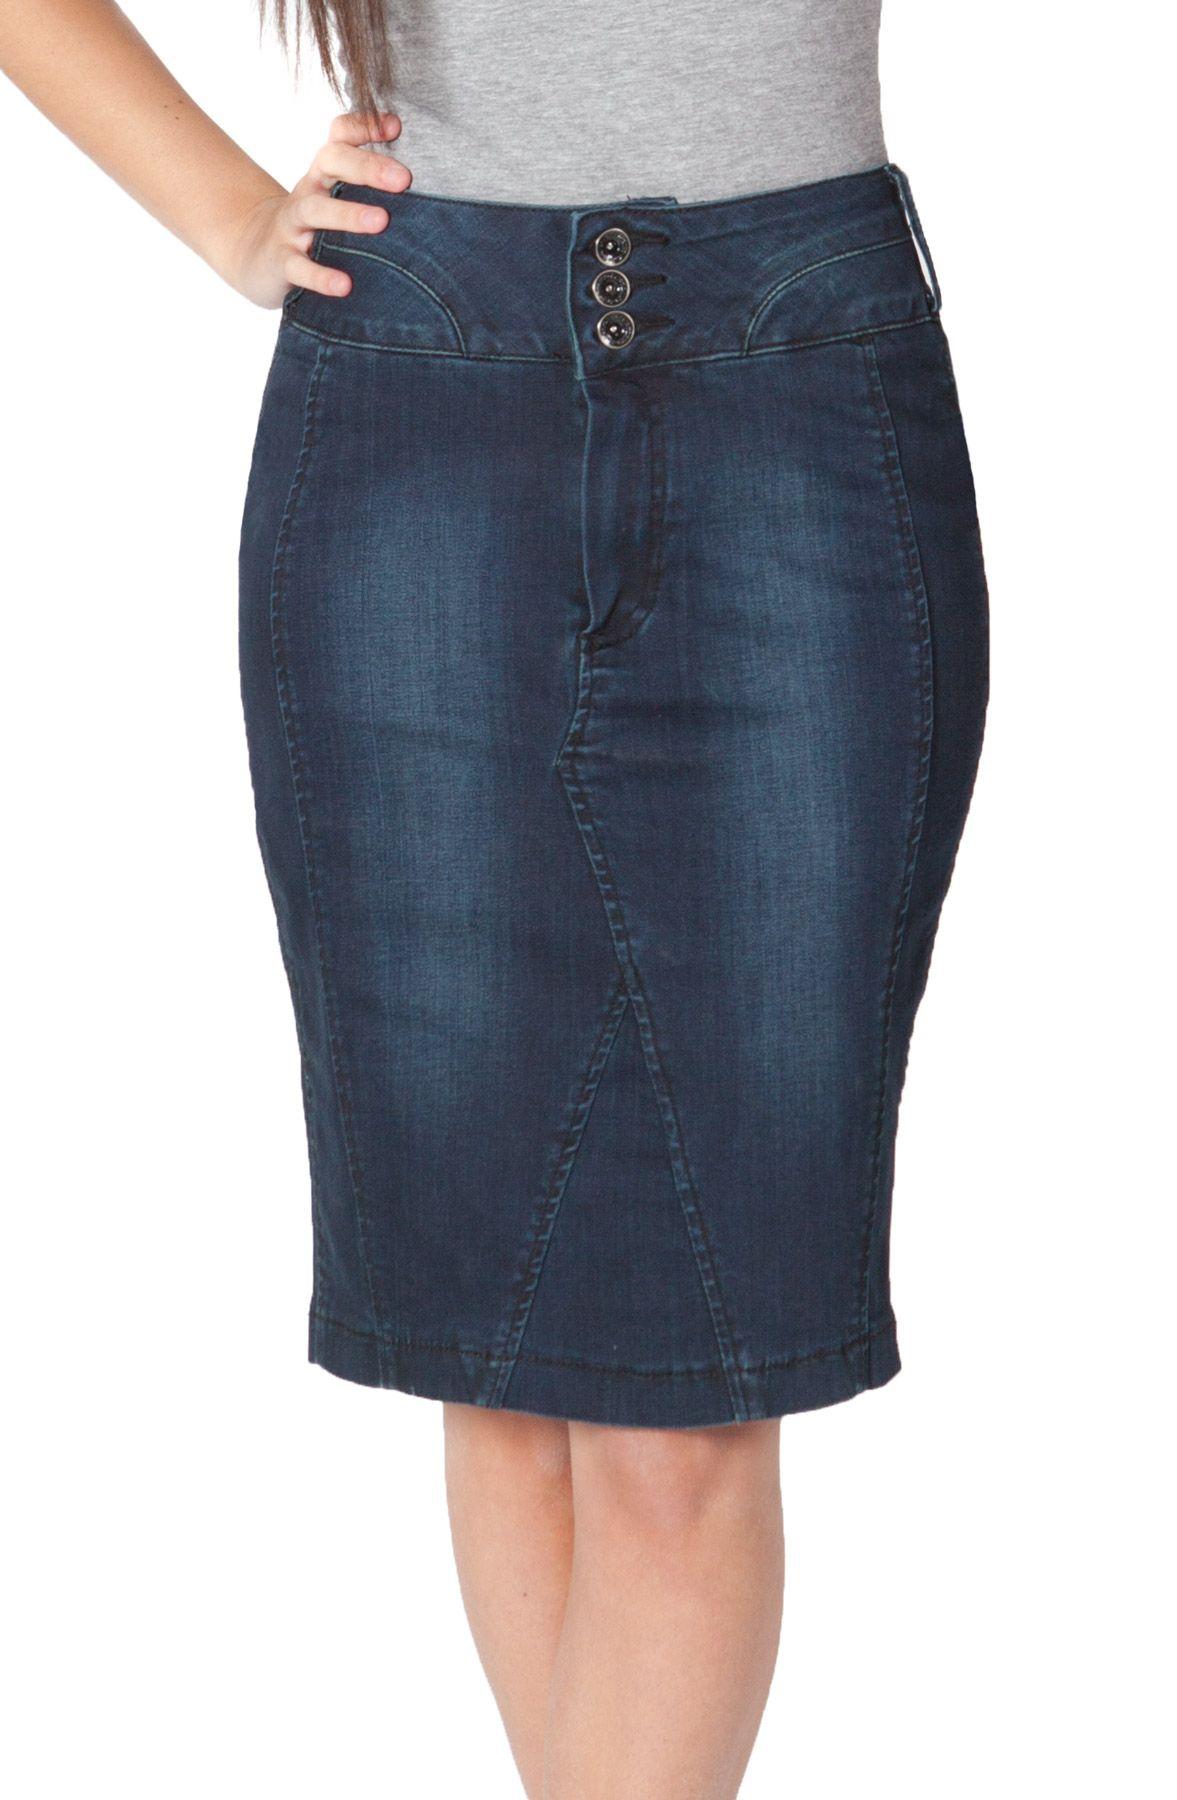 4dfac4f2d2 Gorgeous dark indigo knee-length denim pencil skirt. This stylish # denimskirt is available in UK sizes 6 - 12. #denimfashion #jeanskirt